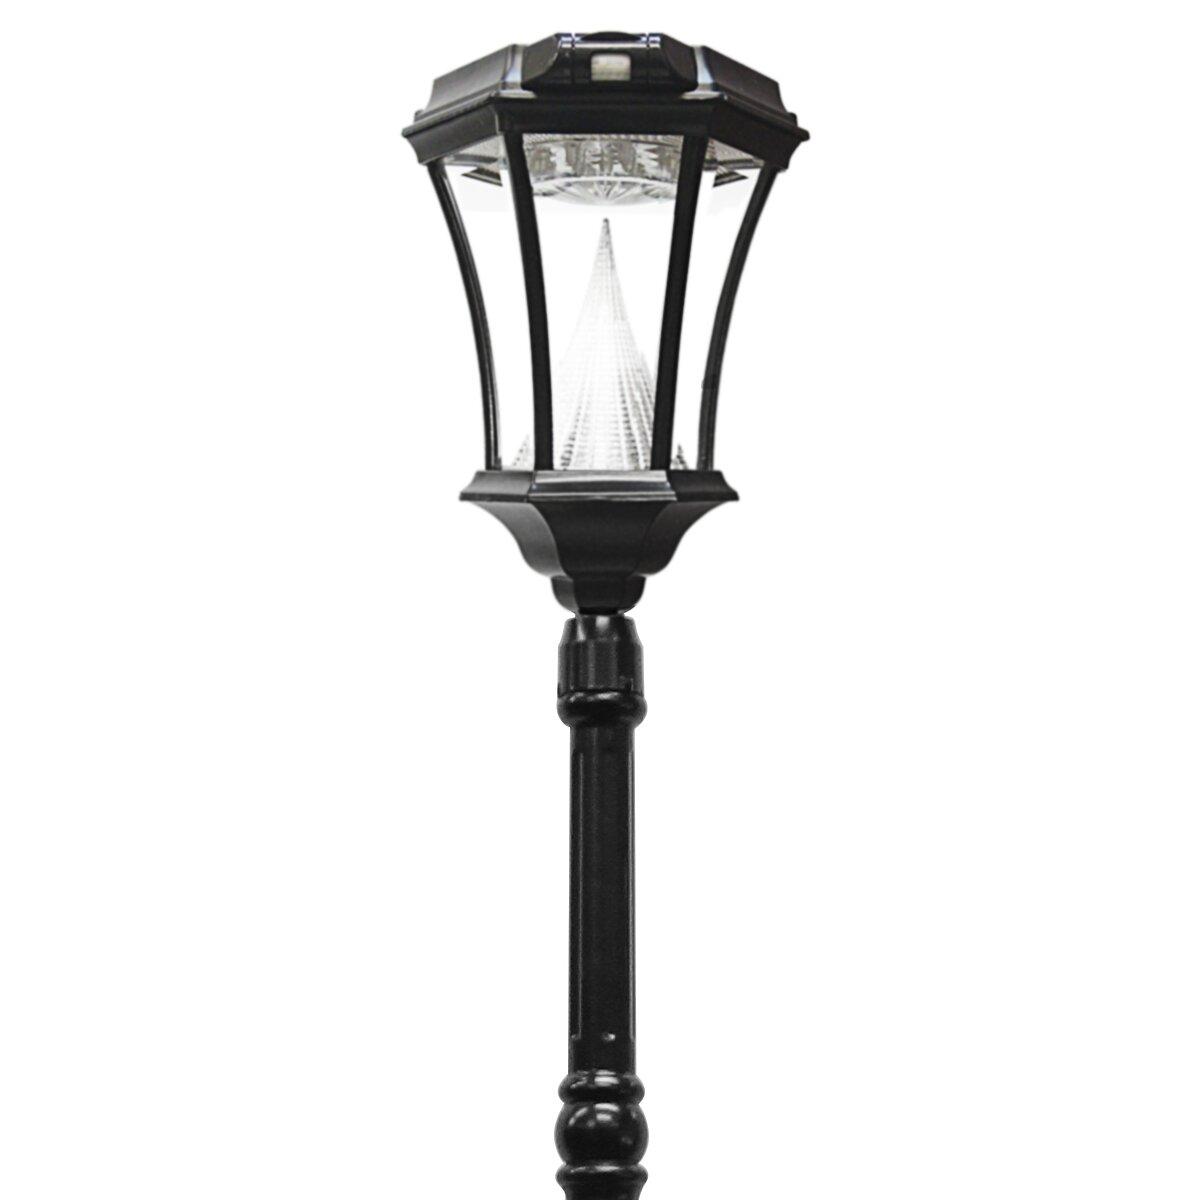 Amazon Com Gama Sonic Windsor Solar Outdoor Post Light: Victorian Solar Lamp Post With Motion Sensor